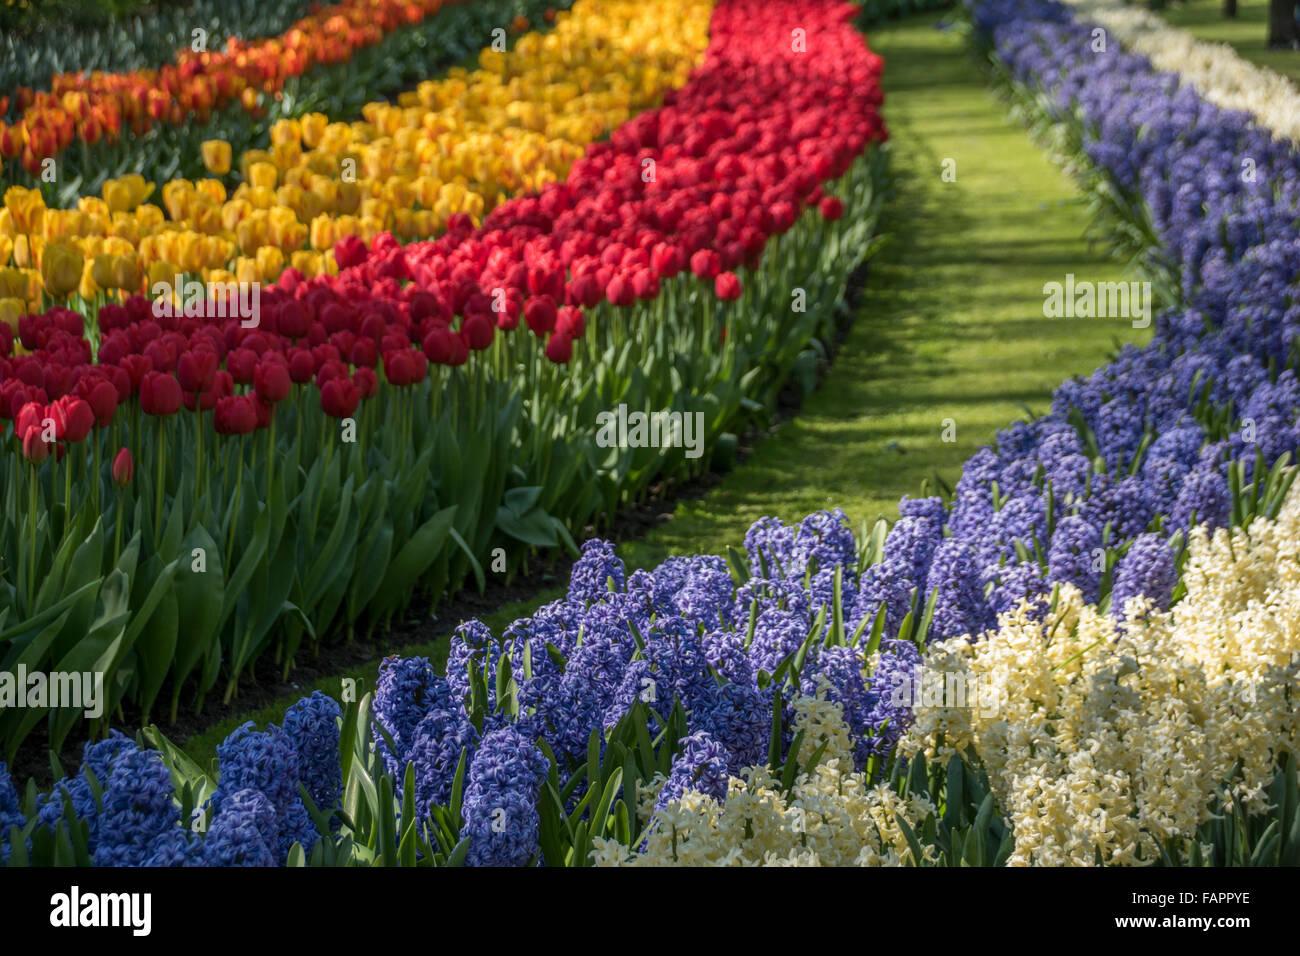 Keukenhof spring garden, Holland - Stock Image